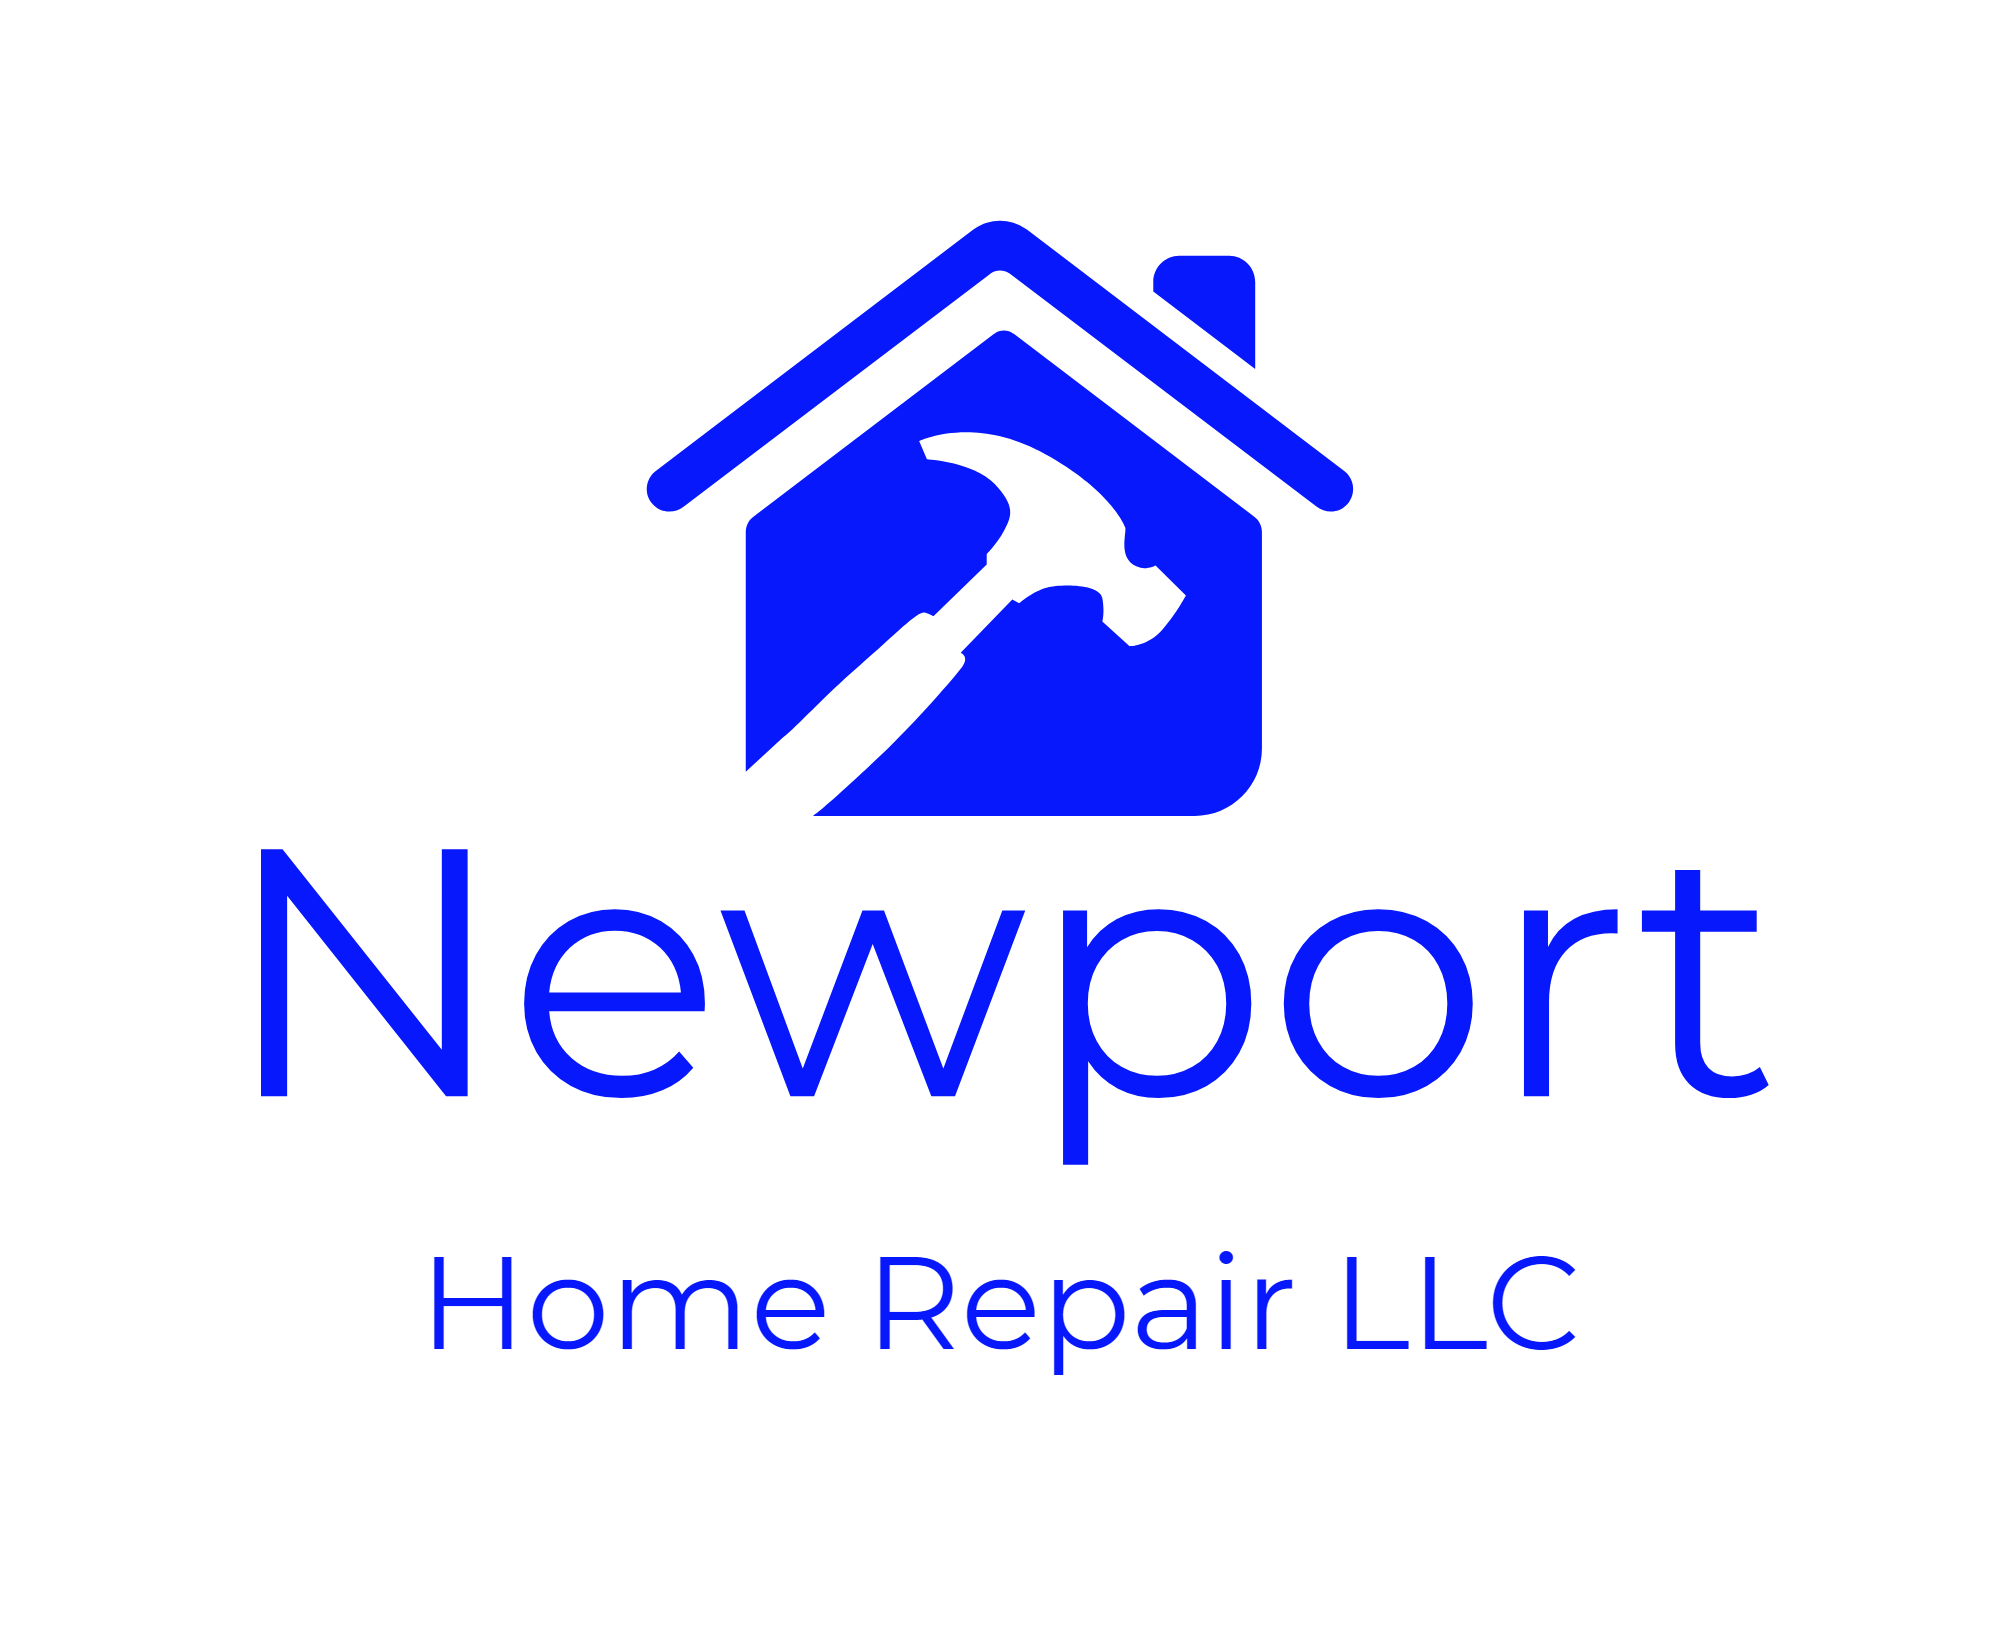 Newport Home Repair LLC - Wood Fence Log Fence